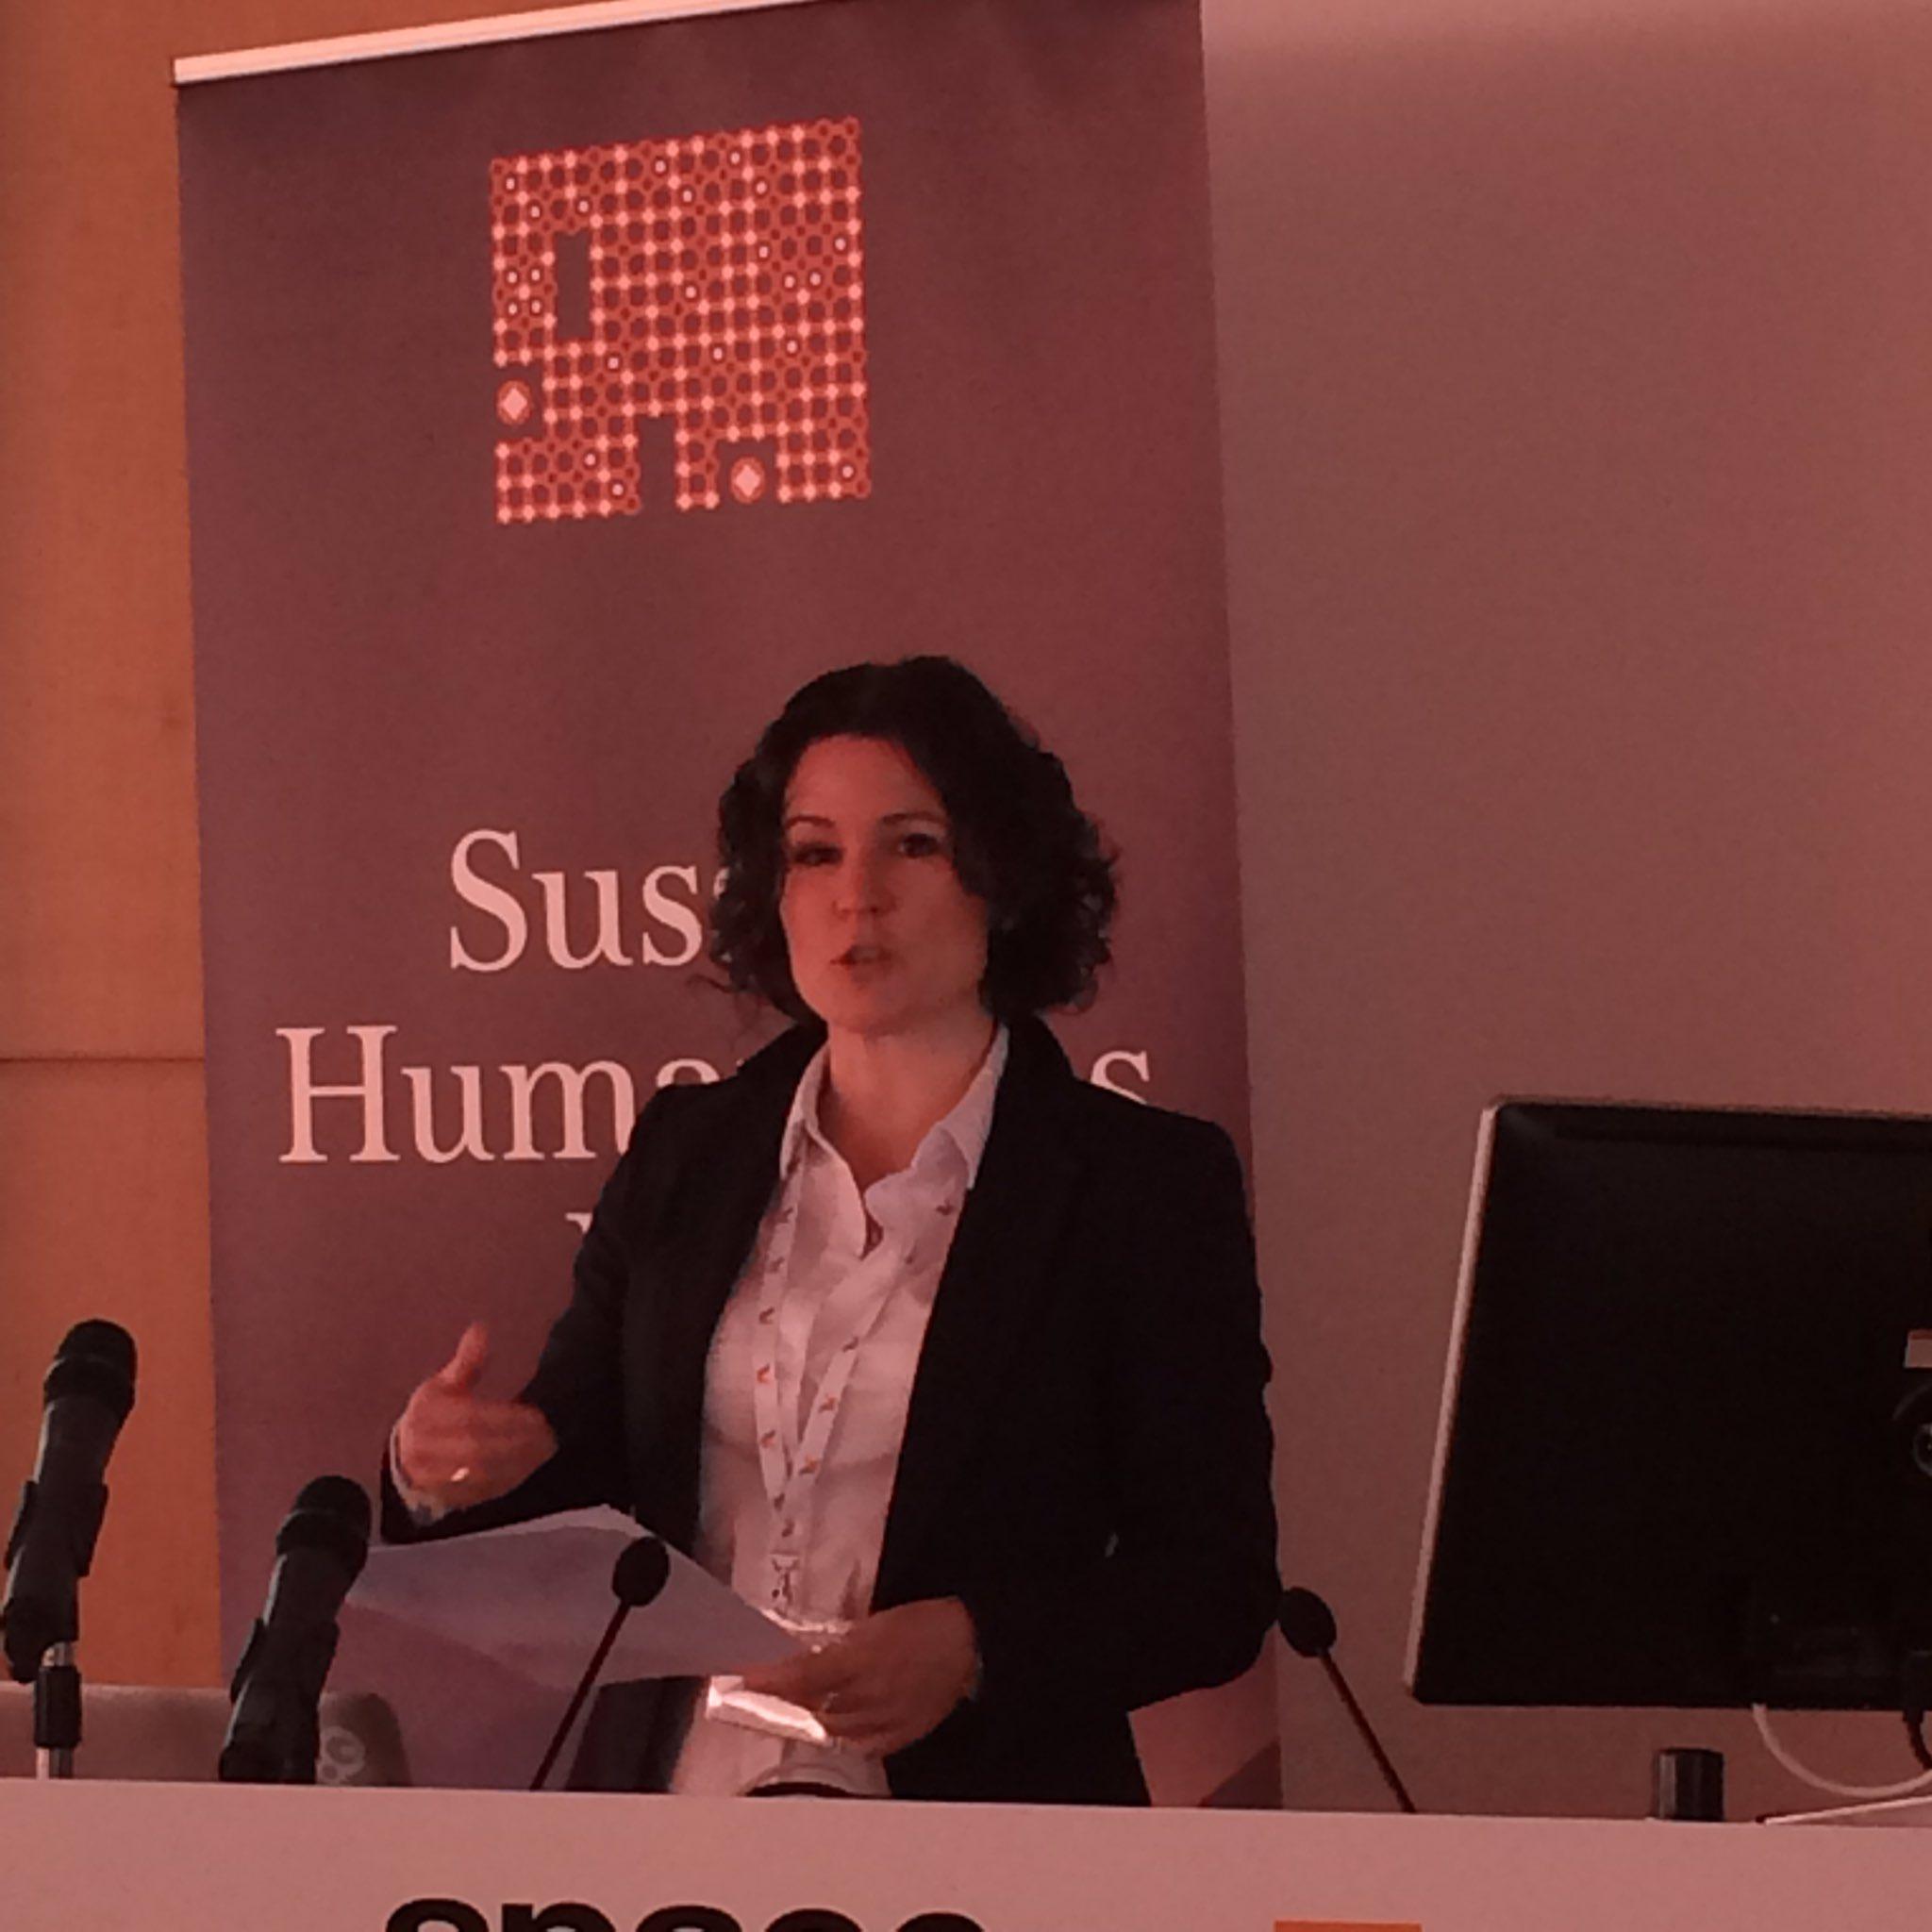 Director of @dri_ireland @natalieharrower speaking at opening of #DPASSH2017 https://t.co/AL2Ou19L5s